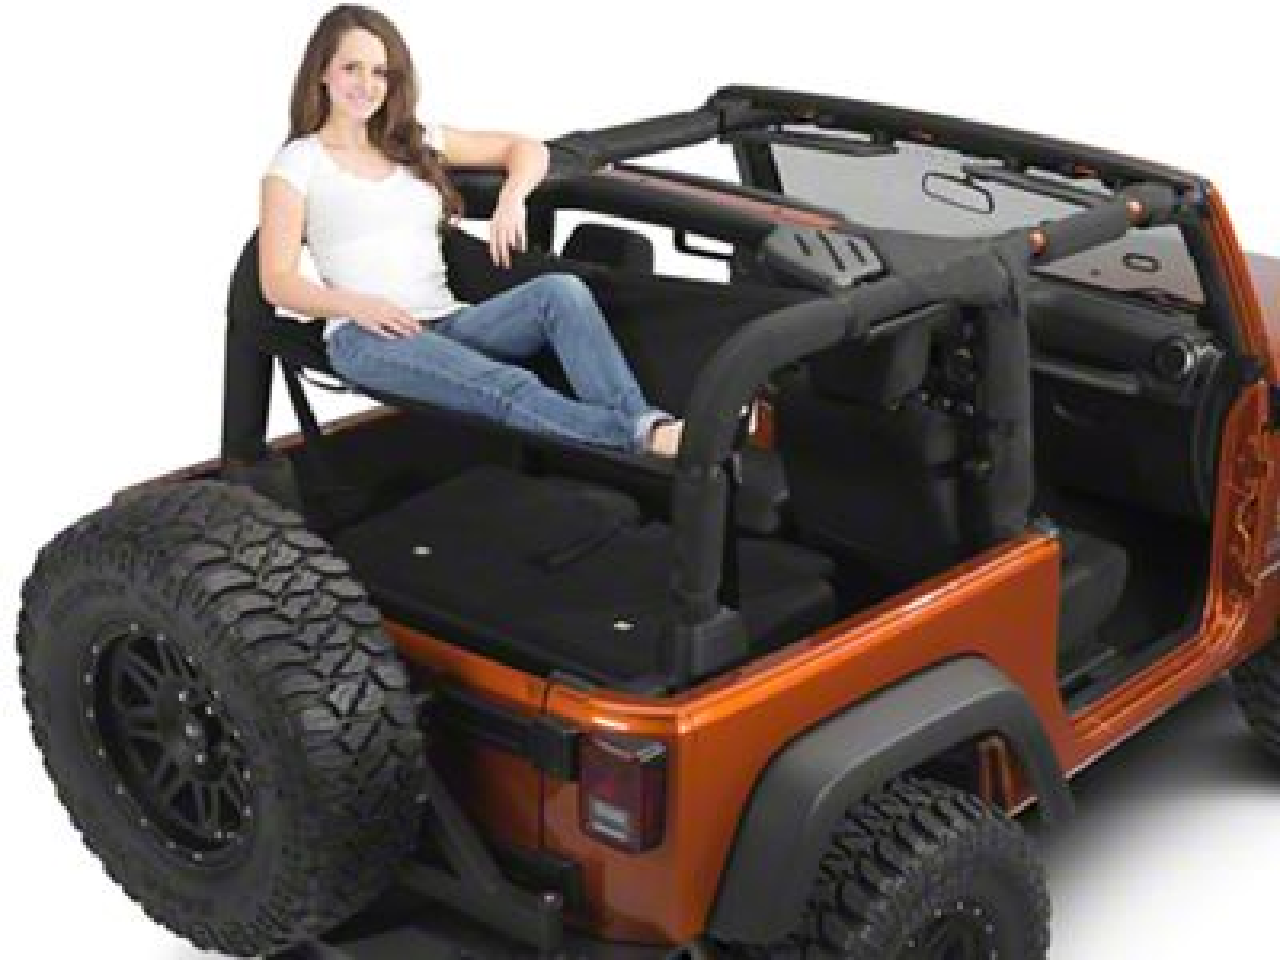 Jammock Jeep Wrangler 2 0 Jeep Hammock Black